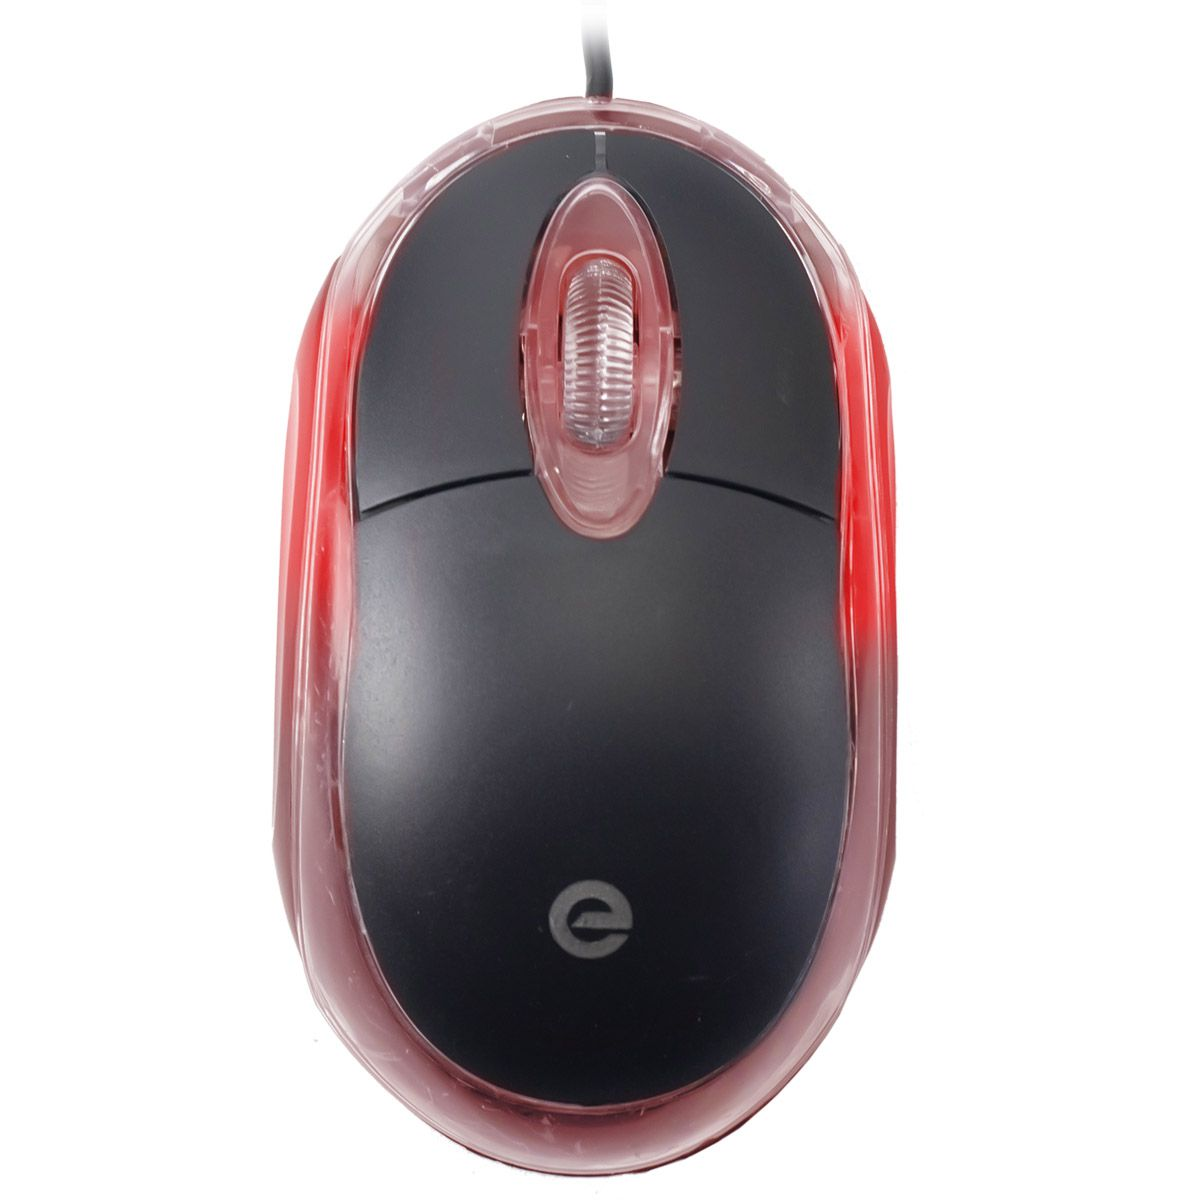 KIT 20x Mouse Óptico USB Exbom MS-9 com Led